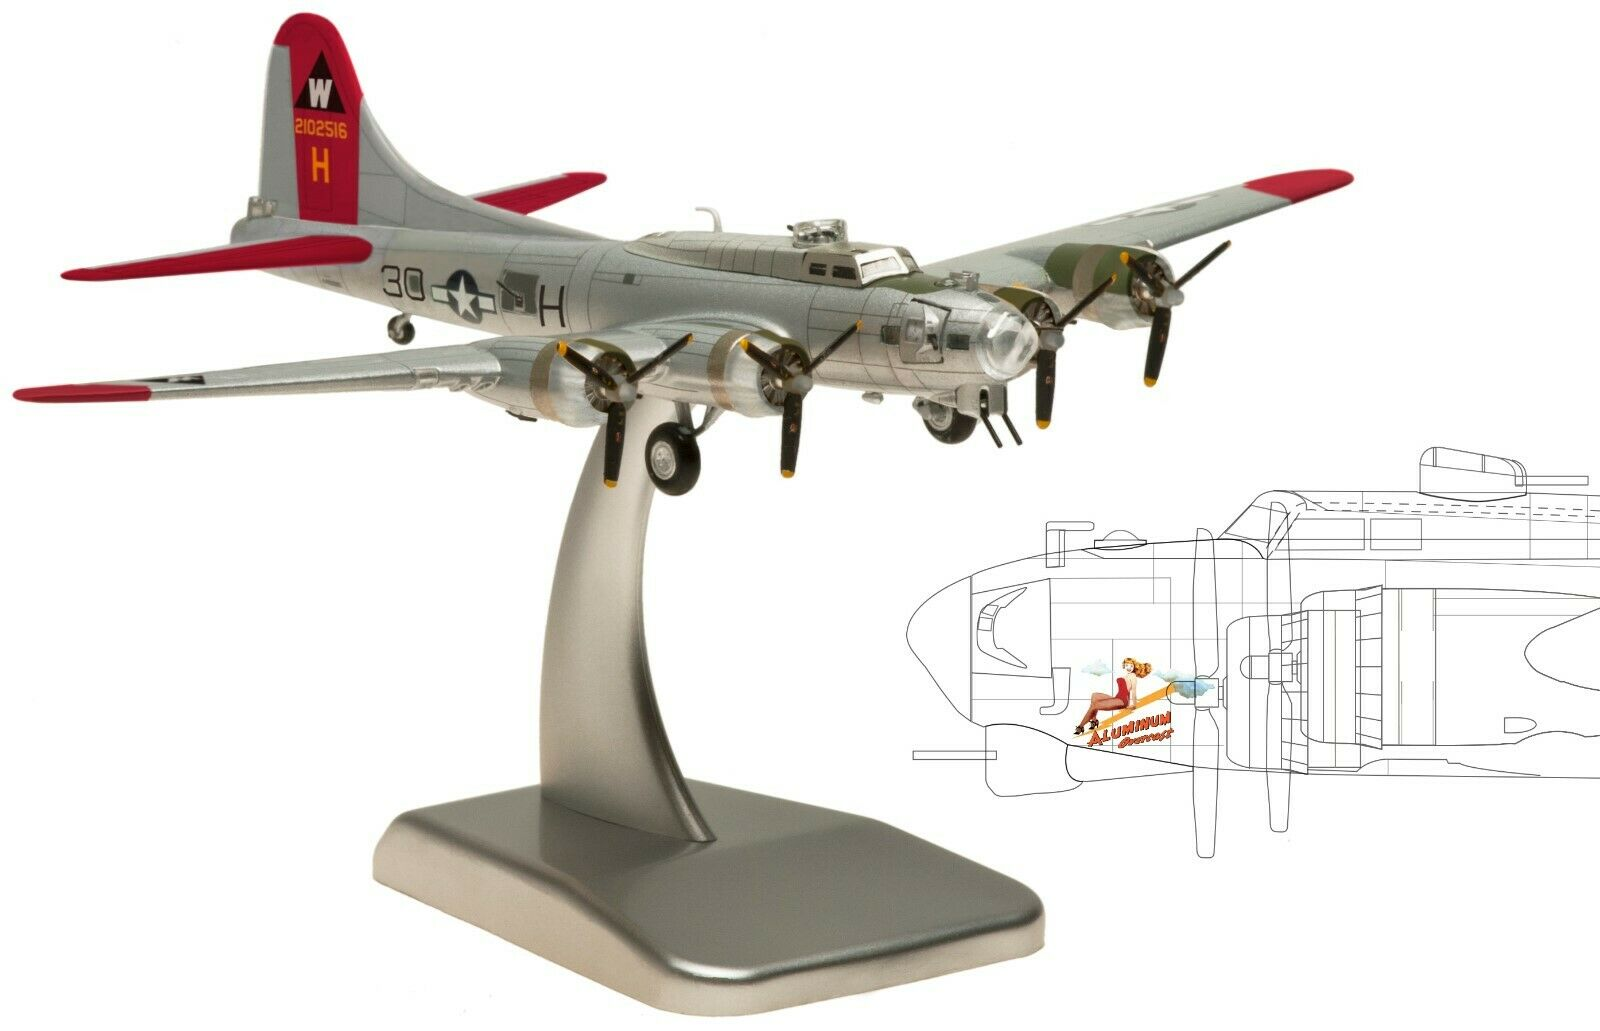 Hogan 1 200 boeing b-17g Flying Fortress, USAAC, avión modelo, embalaje original, nuevo